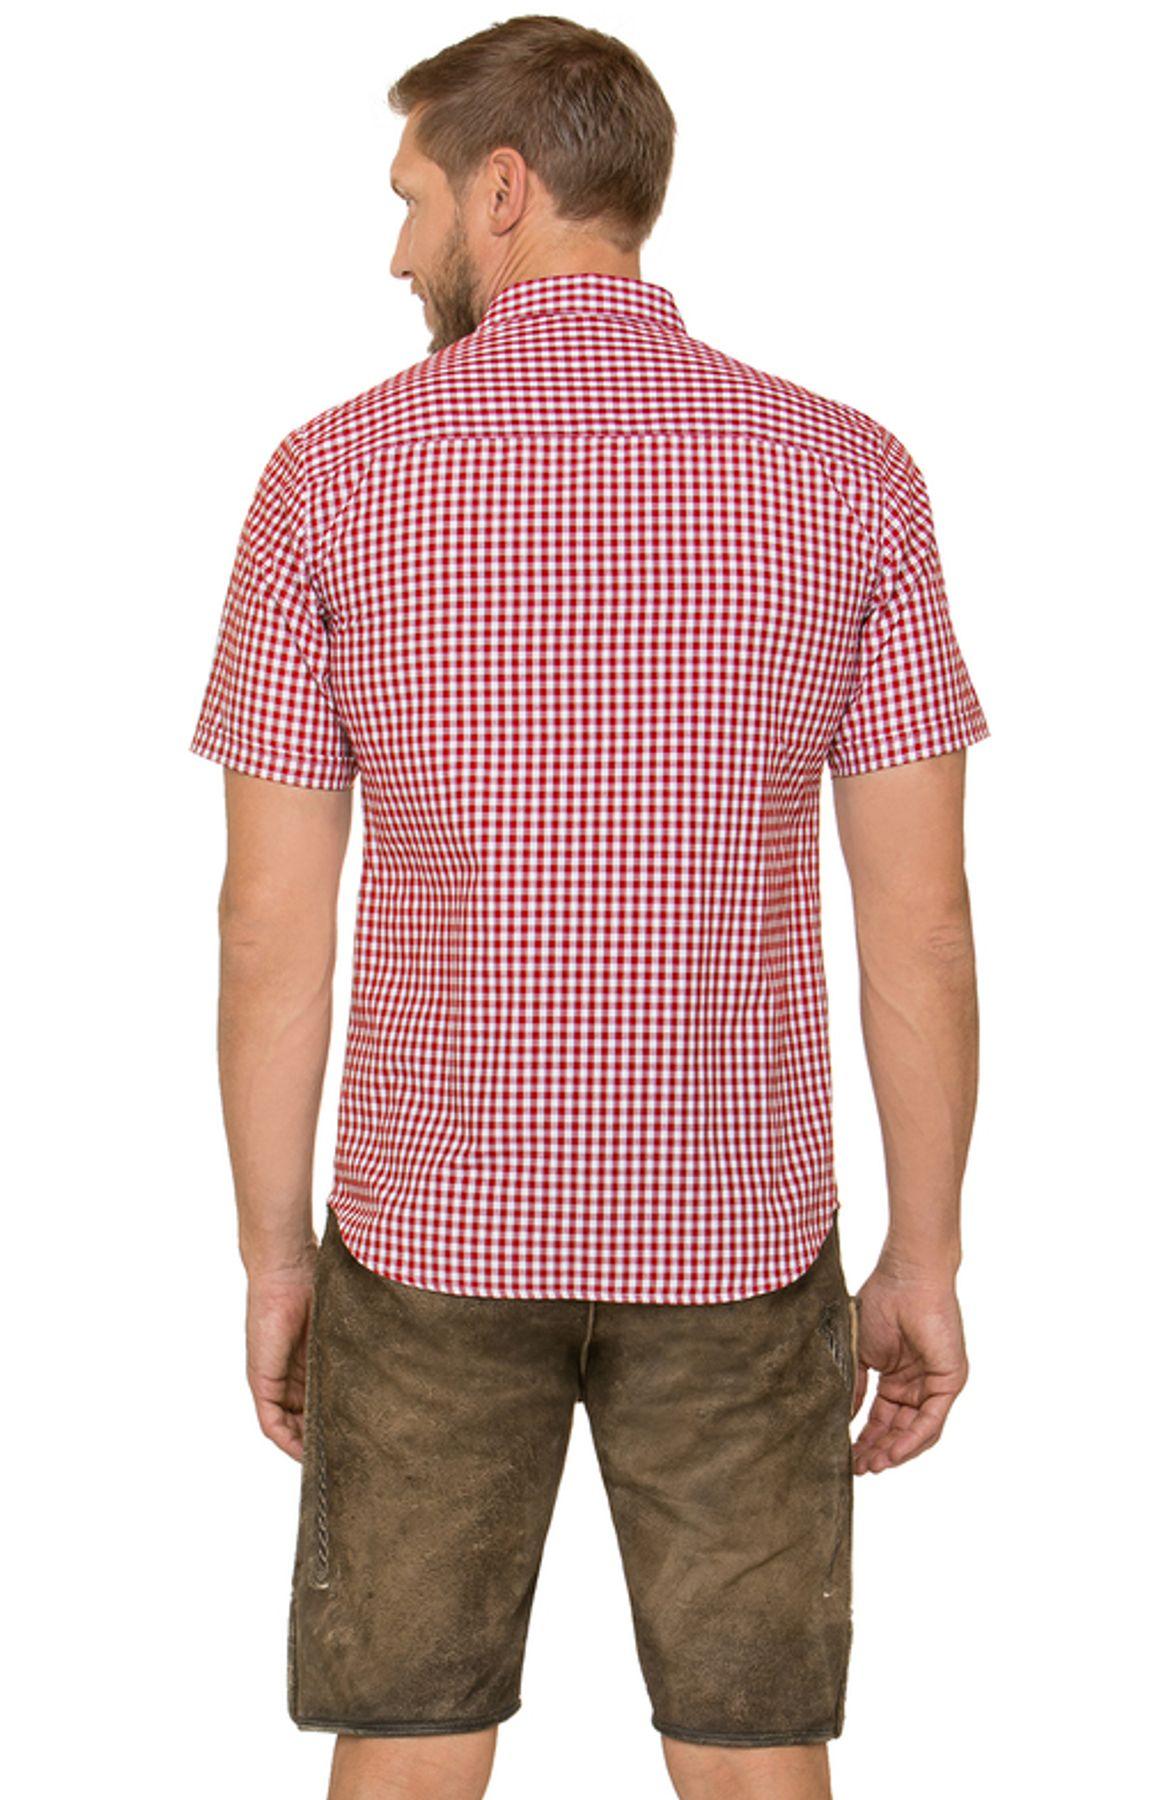 Stockerpoint - Herren kurzarm Trachtenhemd in verschiedenen Farben, Renko3 – Bild 16